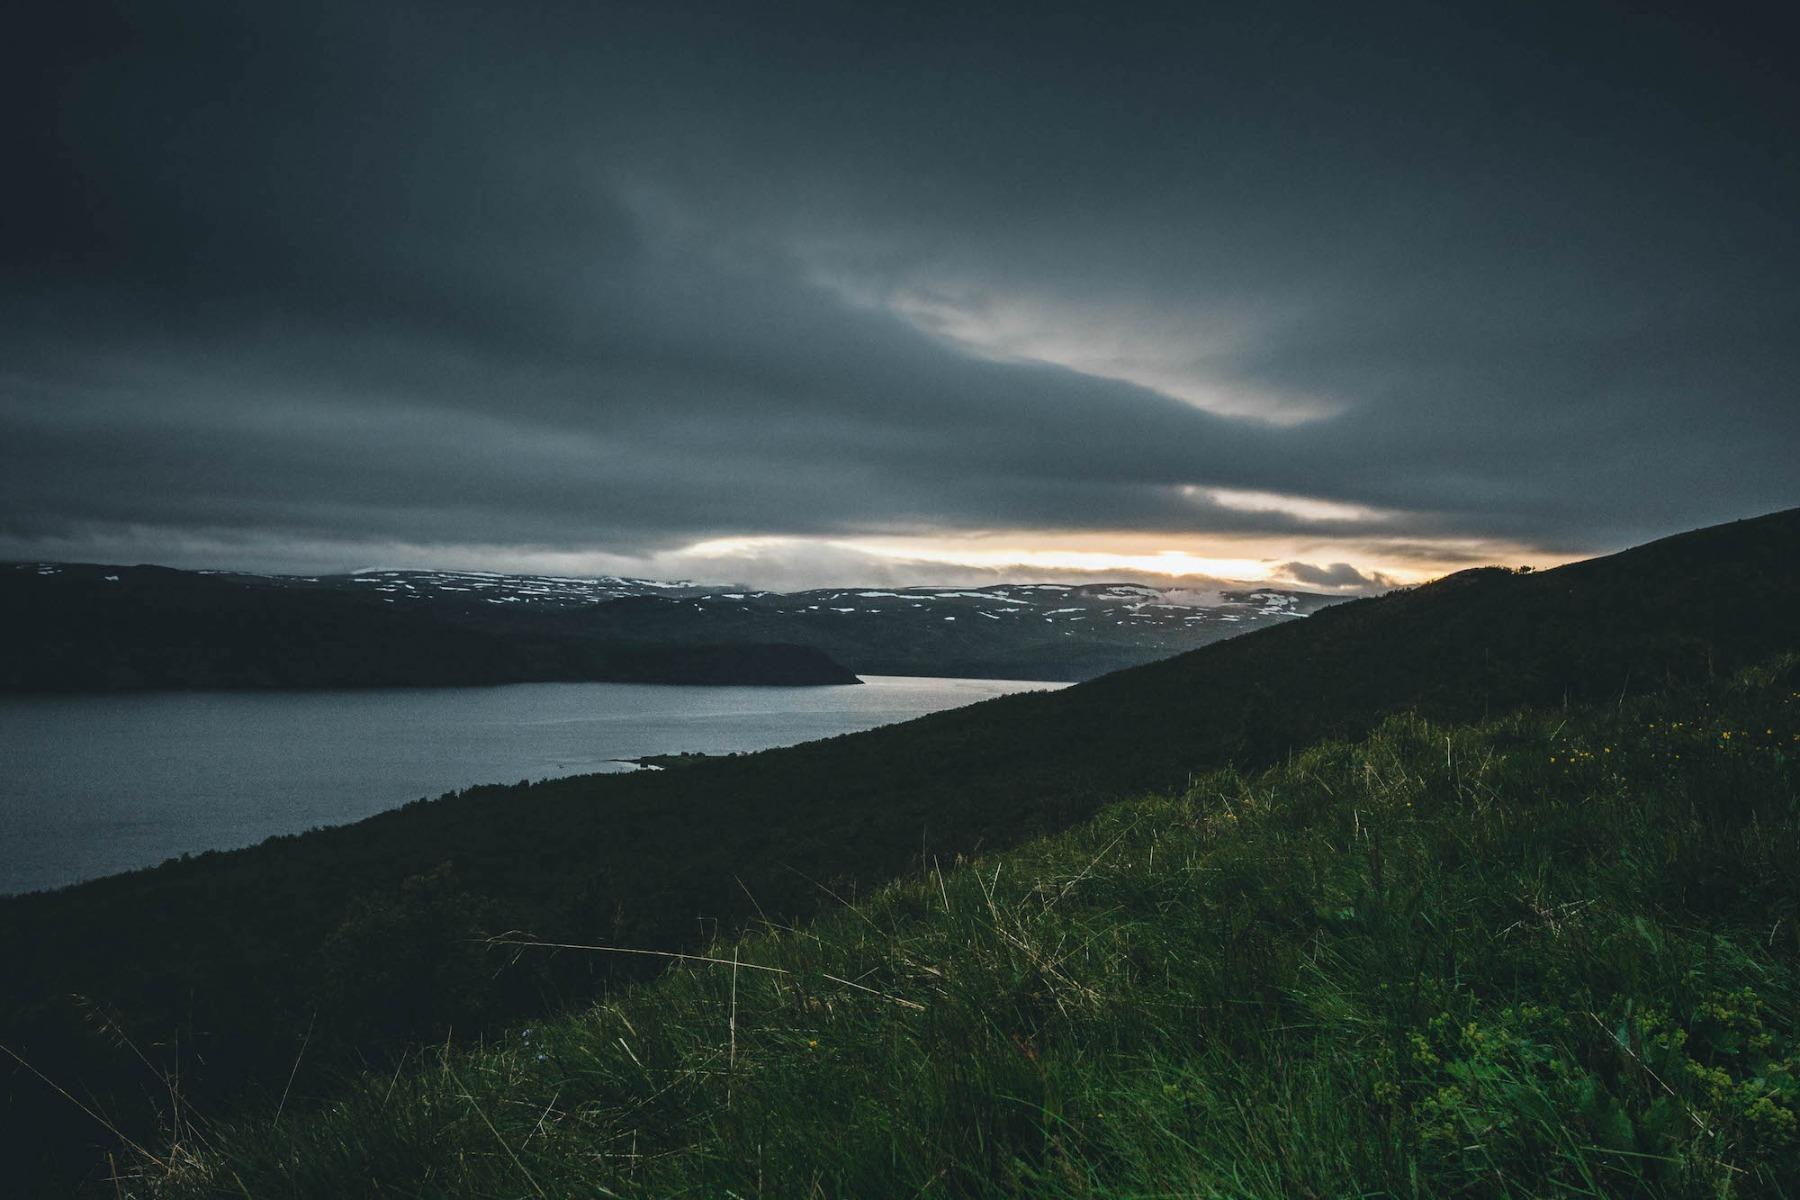 Sonnenuntergang Natur